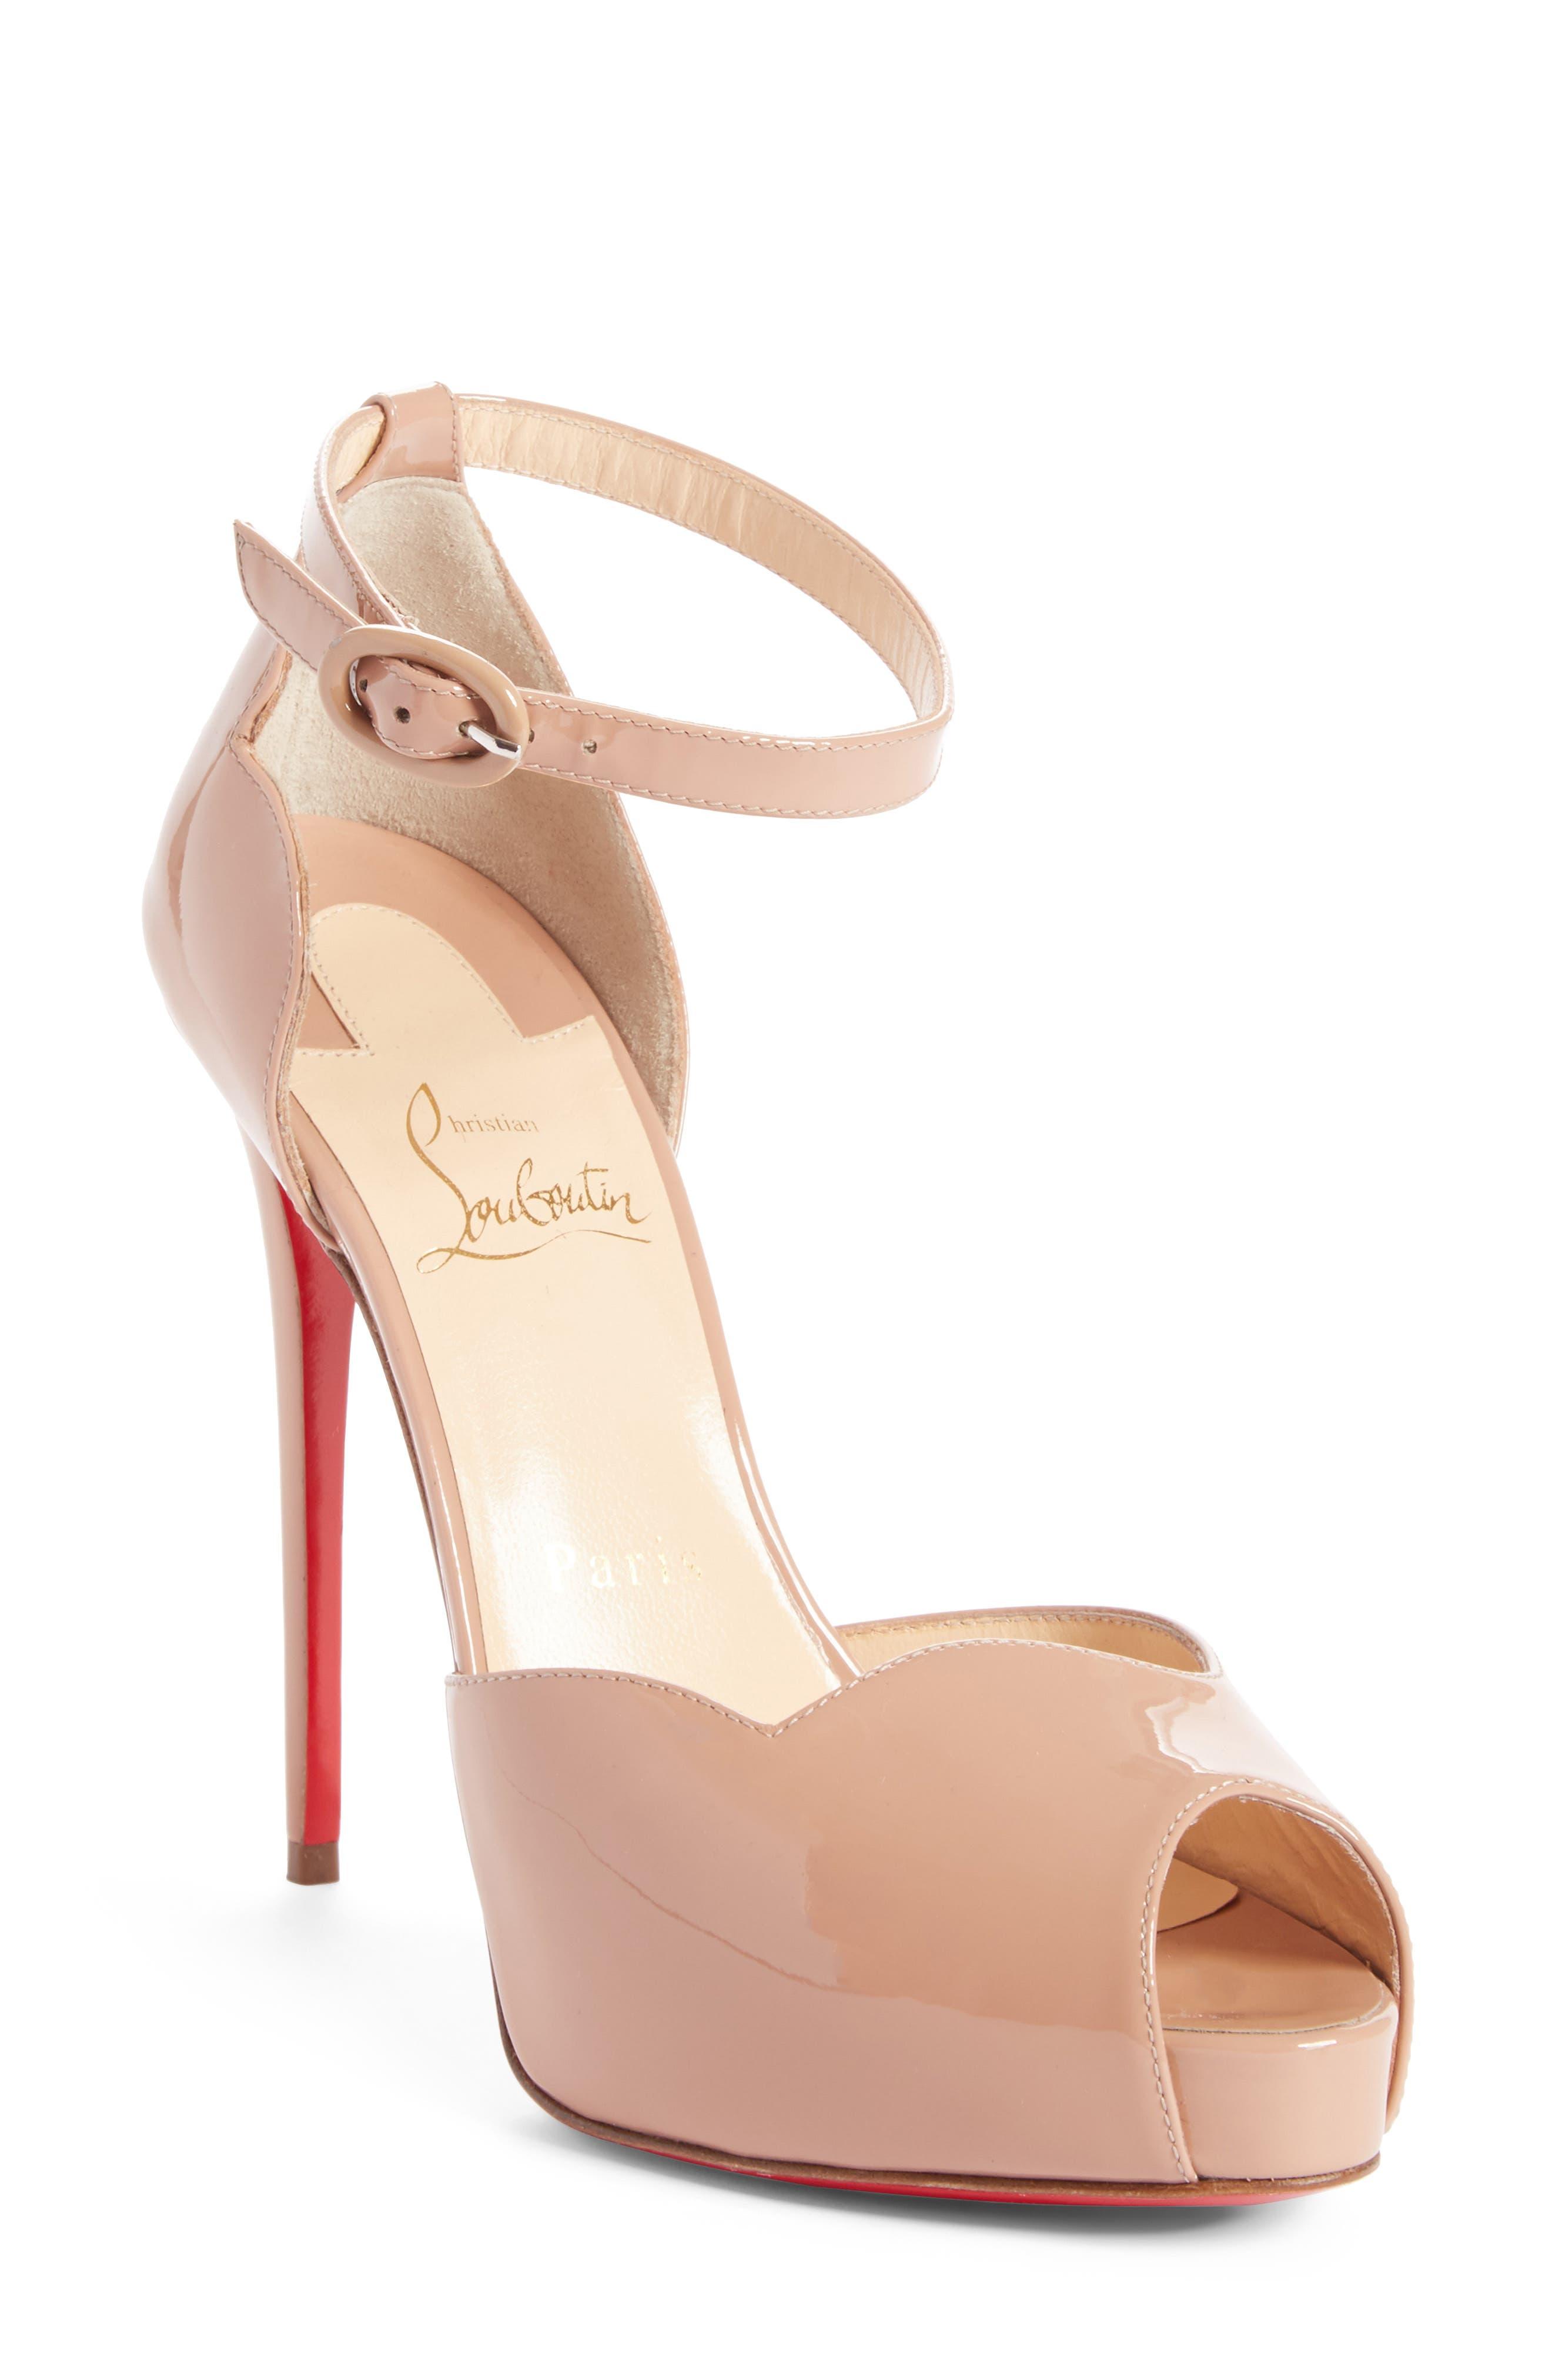 christian louboutin beige high heels